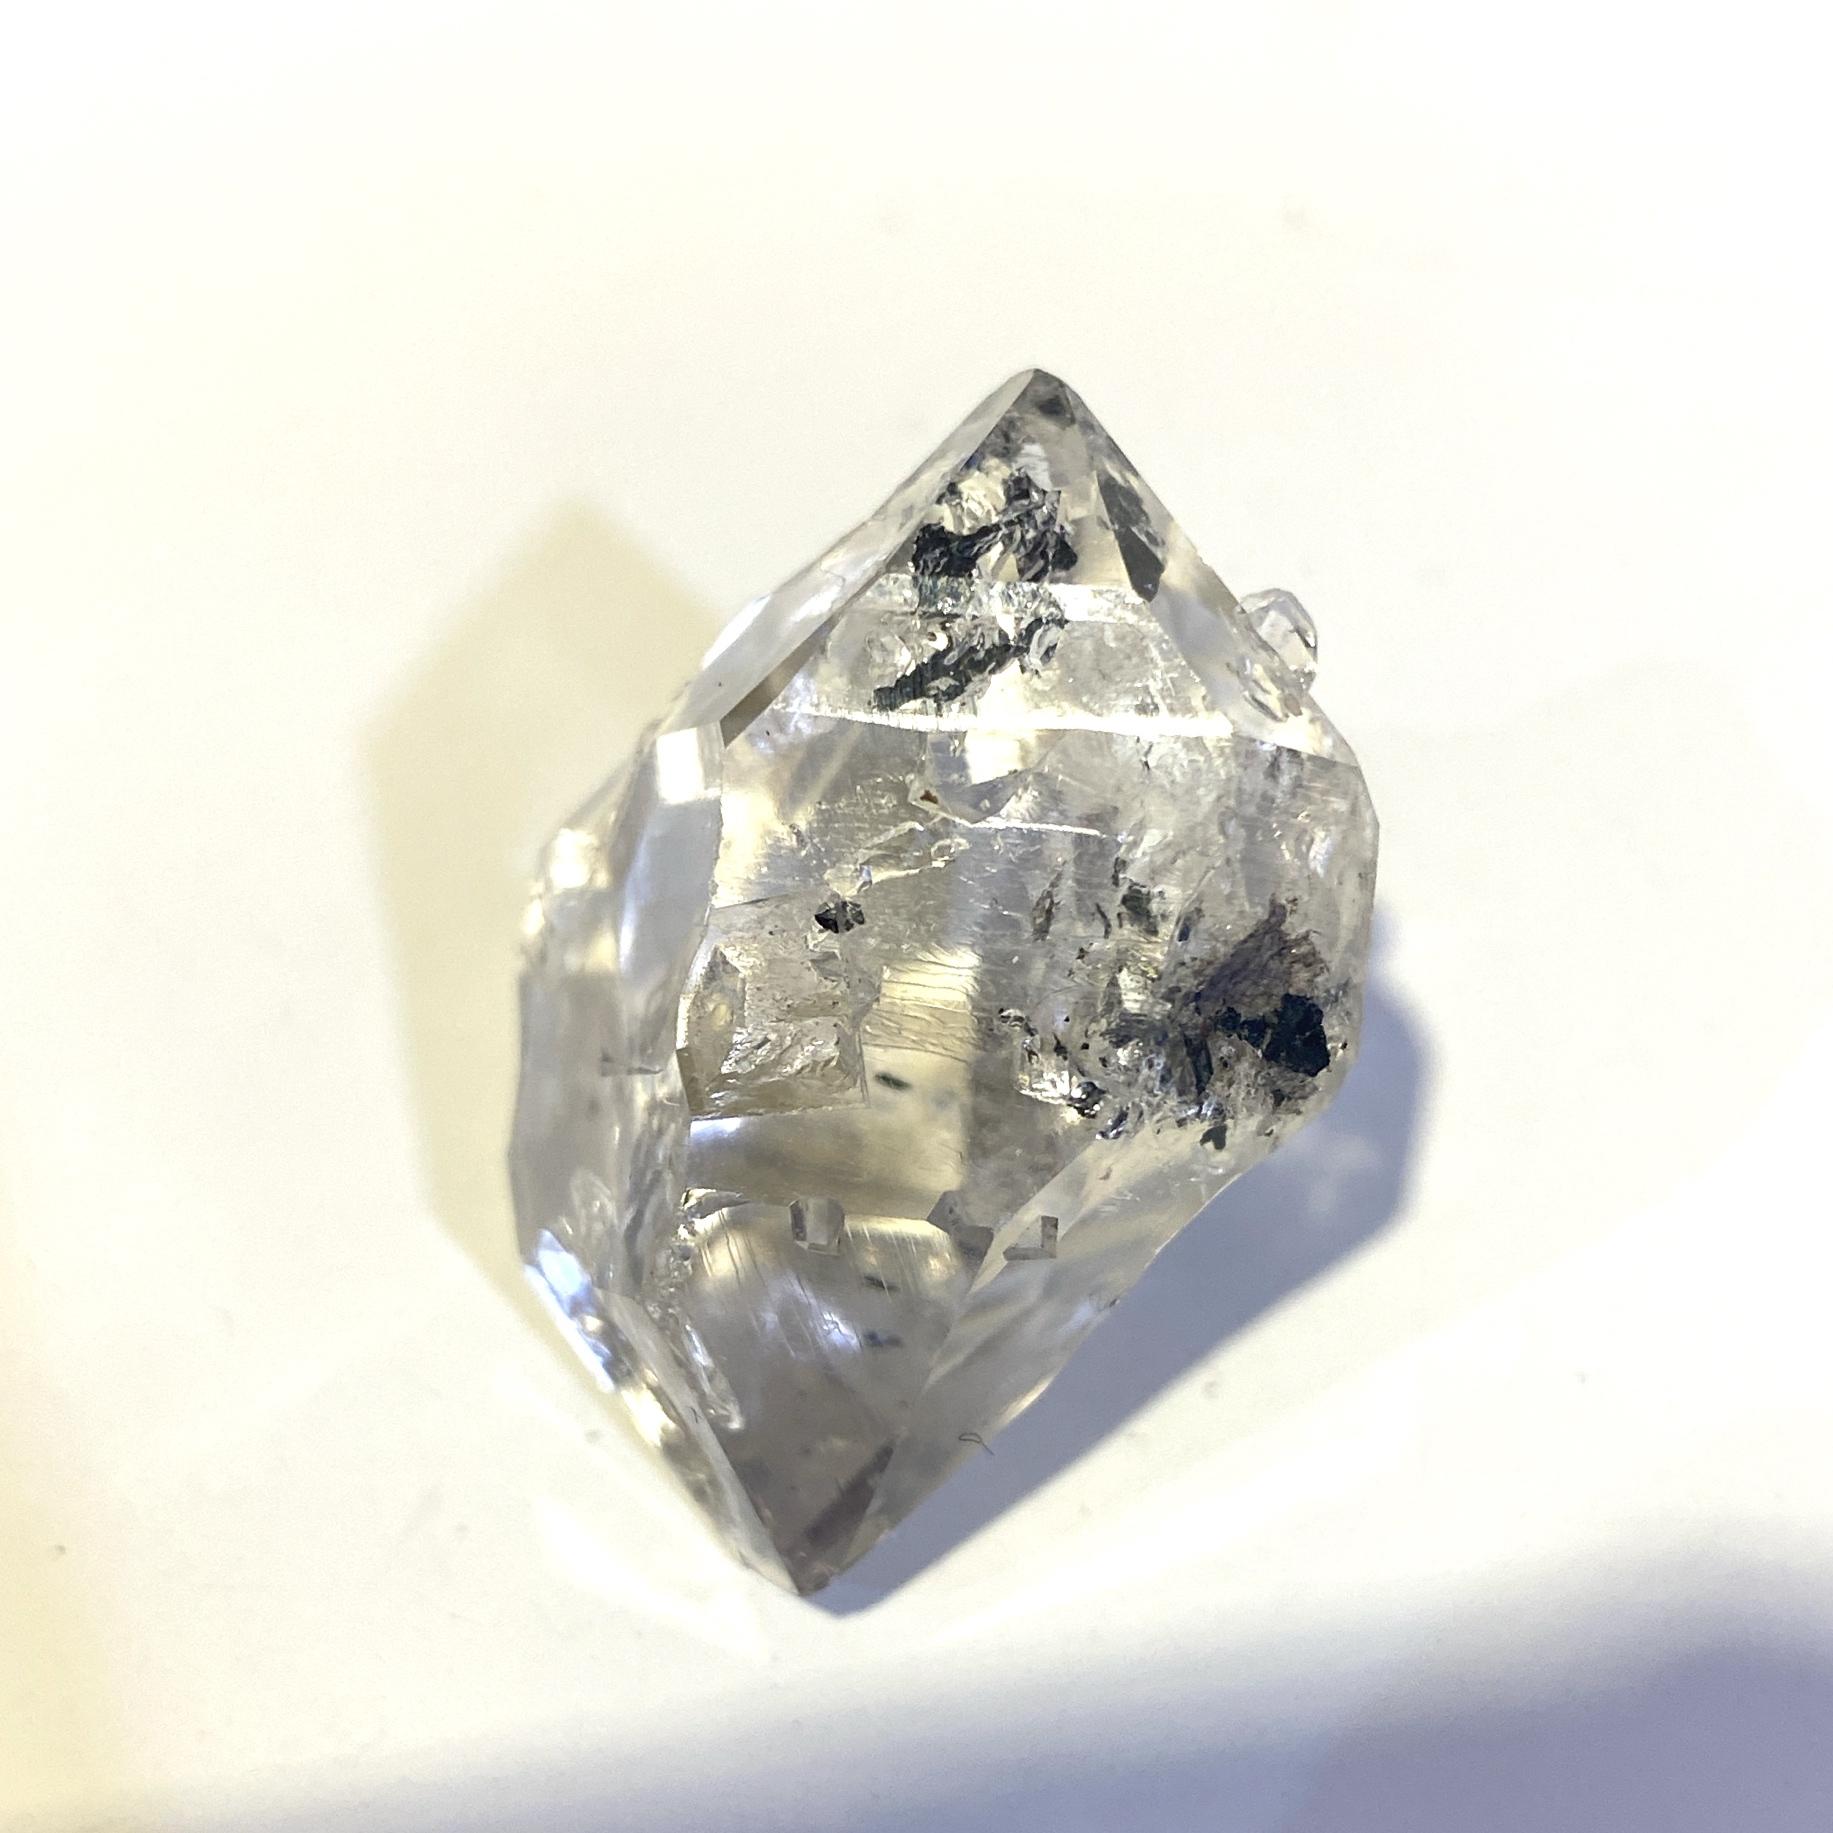 Diamond Quartz / ダイヤモンドクォーツ  一点もの エレスチャル 4月誕生石 鉱物 パワーストーン